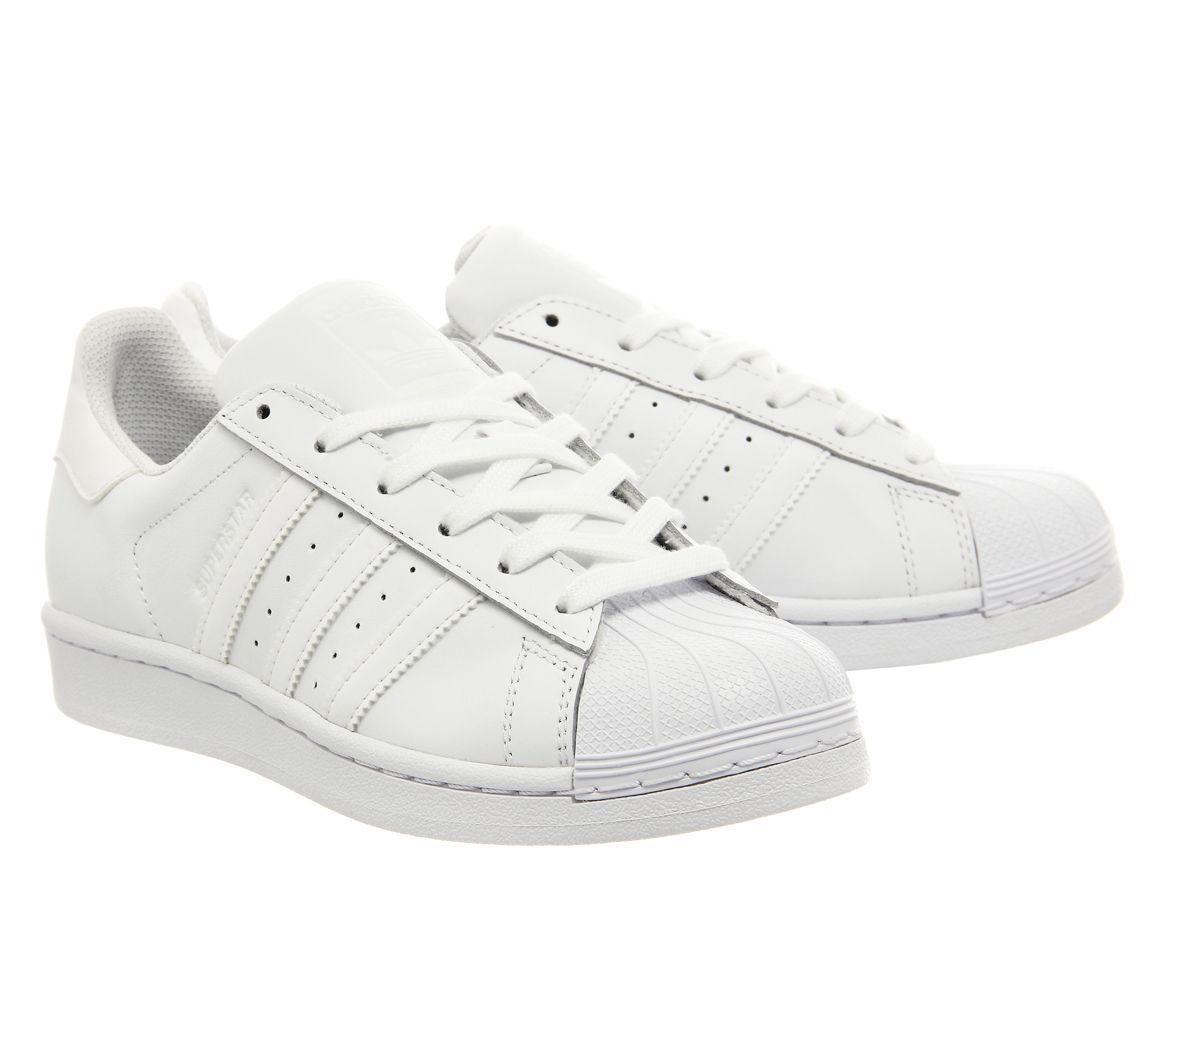 adidas zapatos superstar